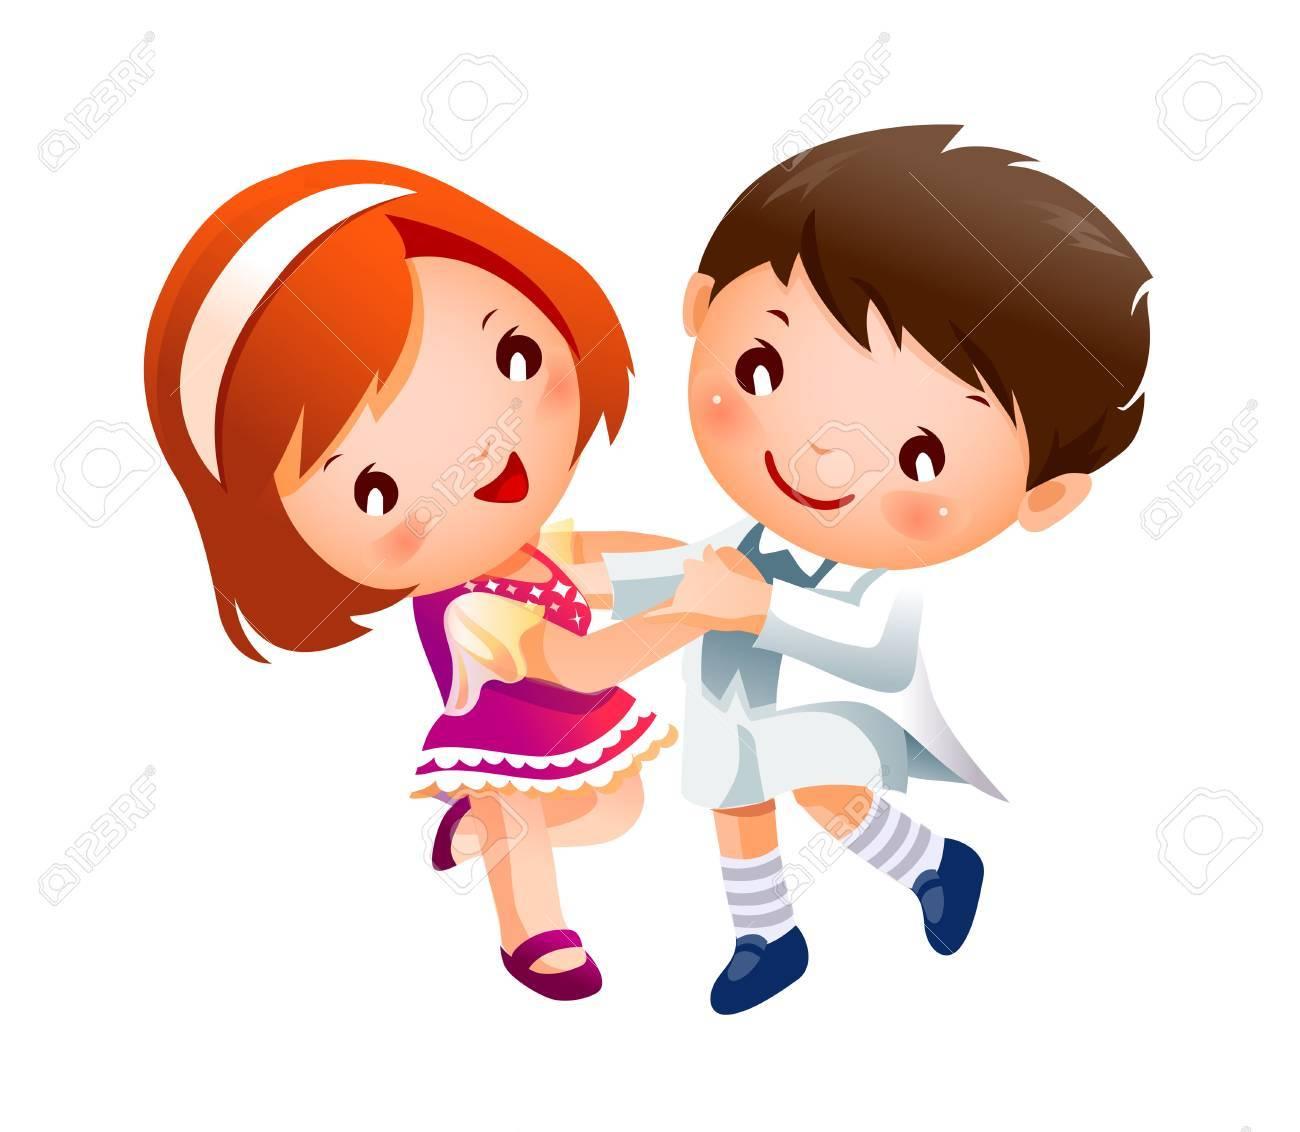 Boy and Girl dancing.